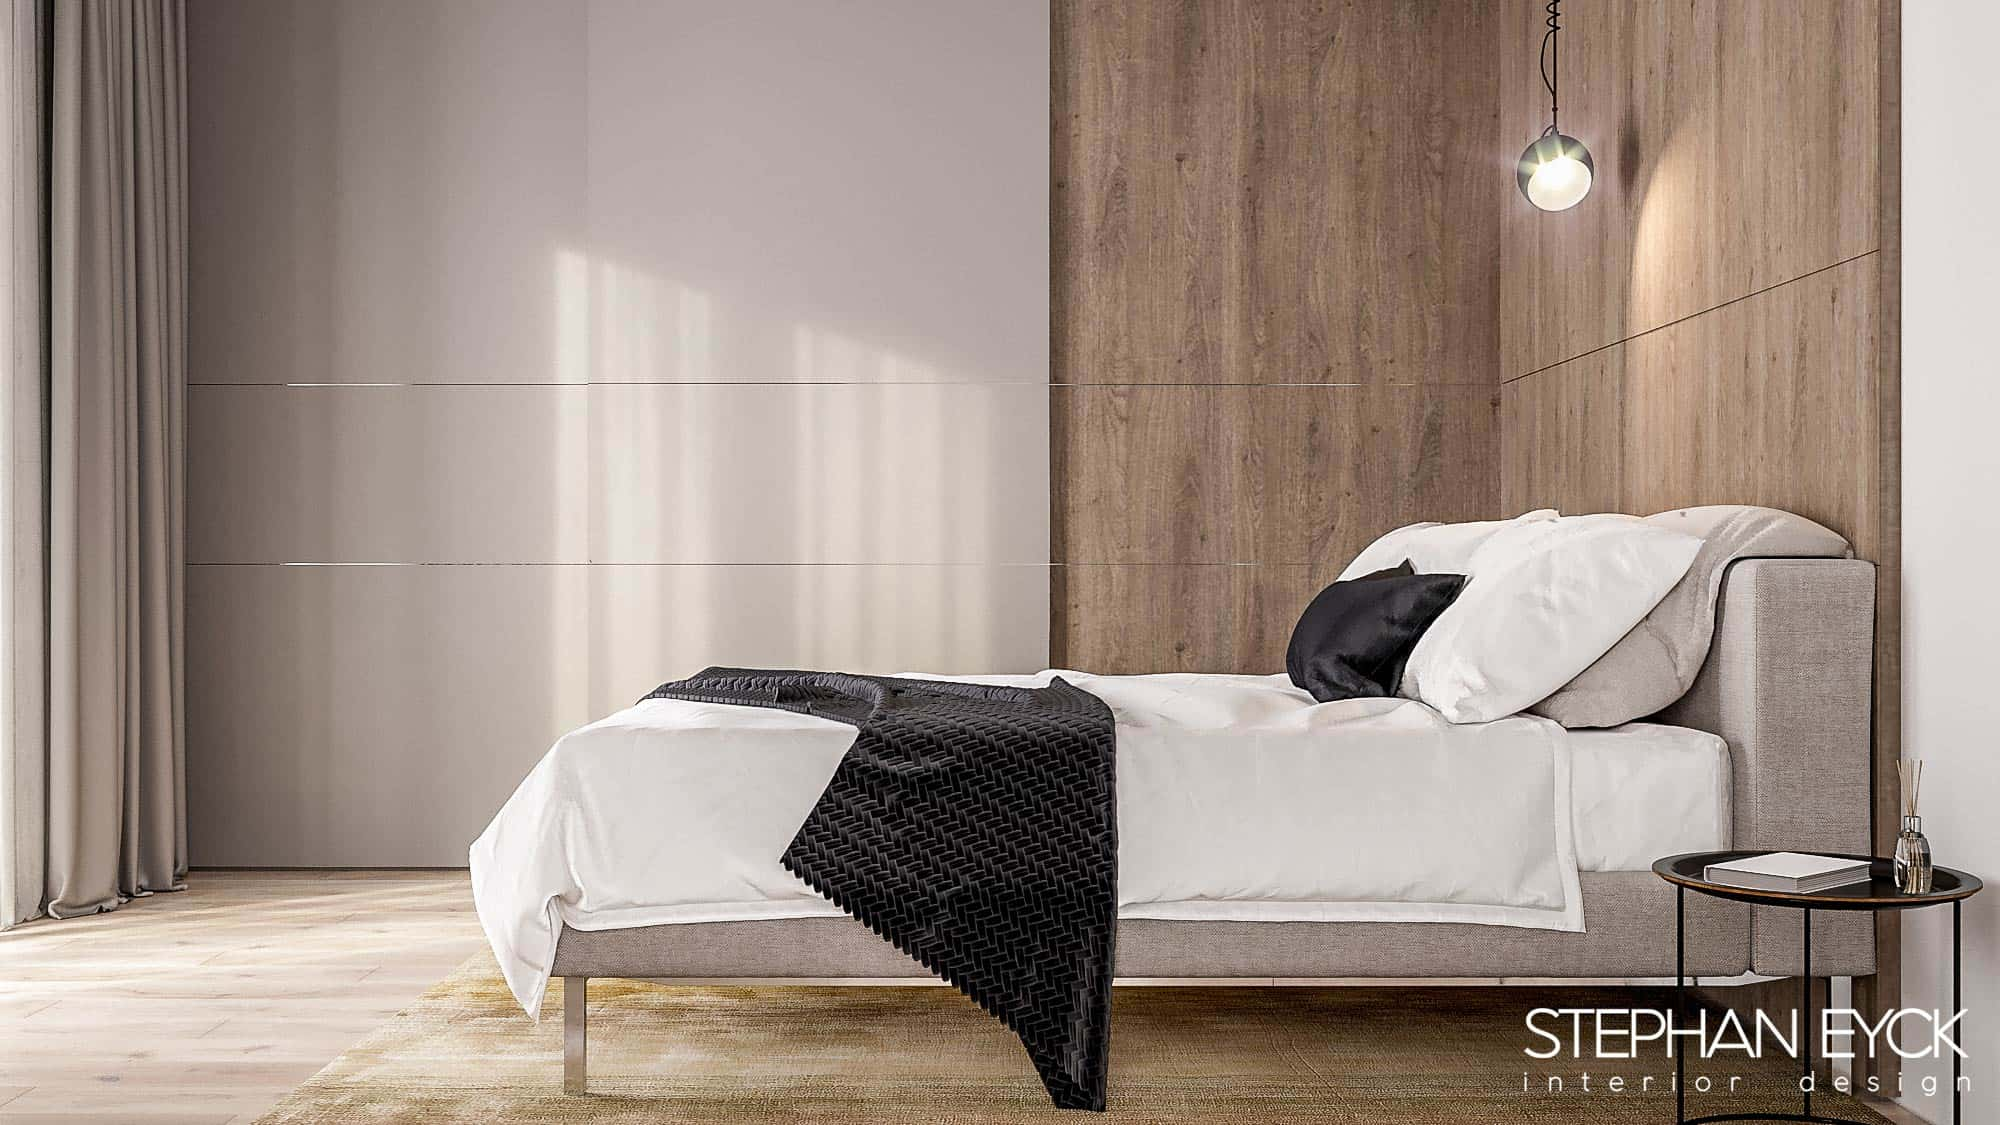 dormitor matrimonial 03 Stephan Eyck